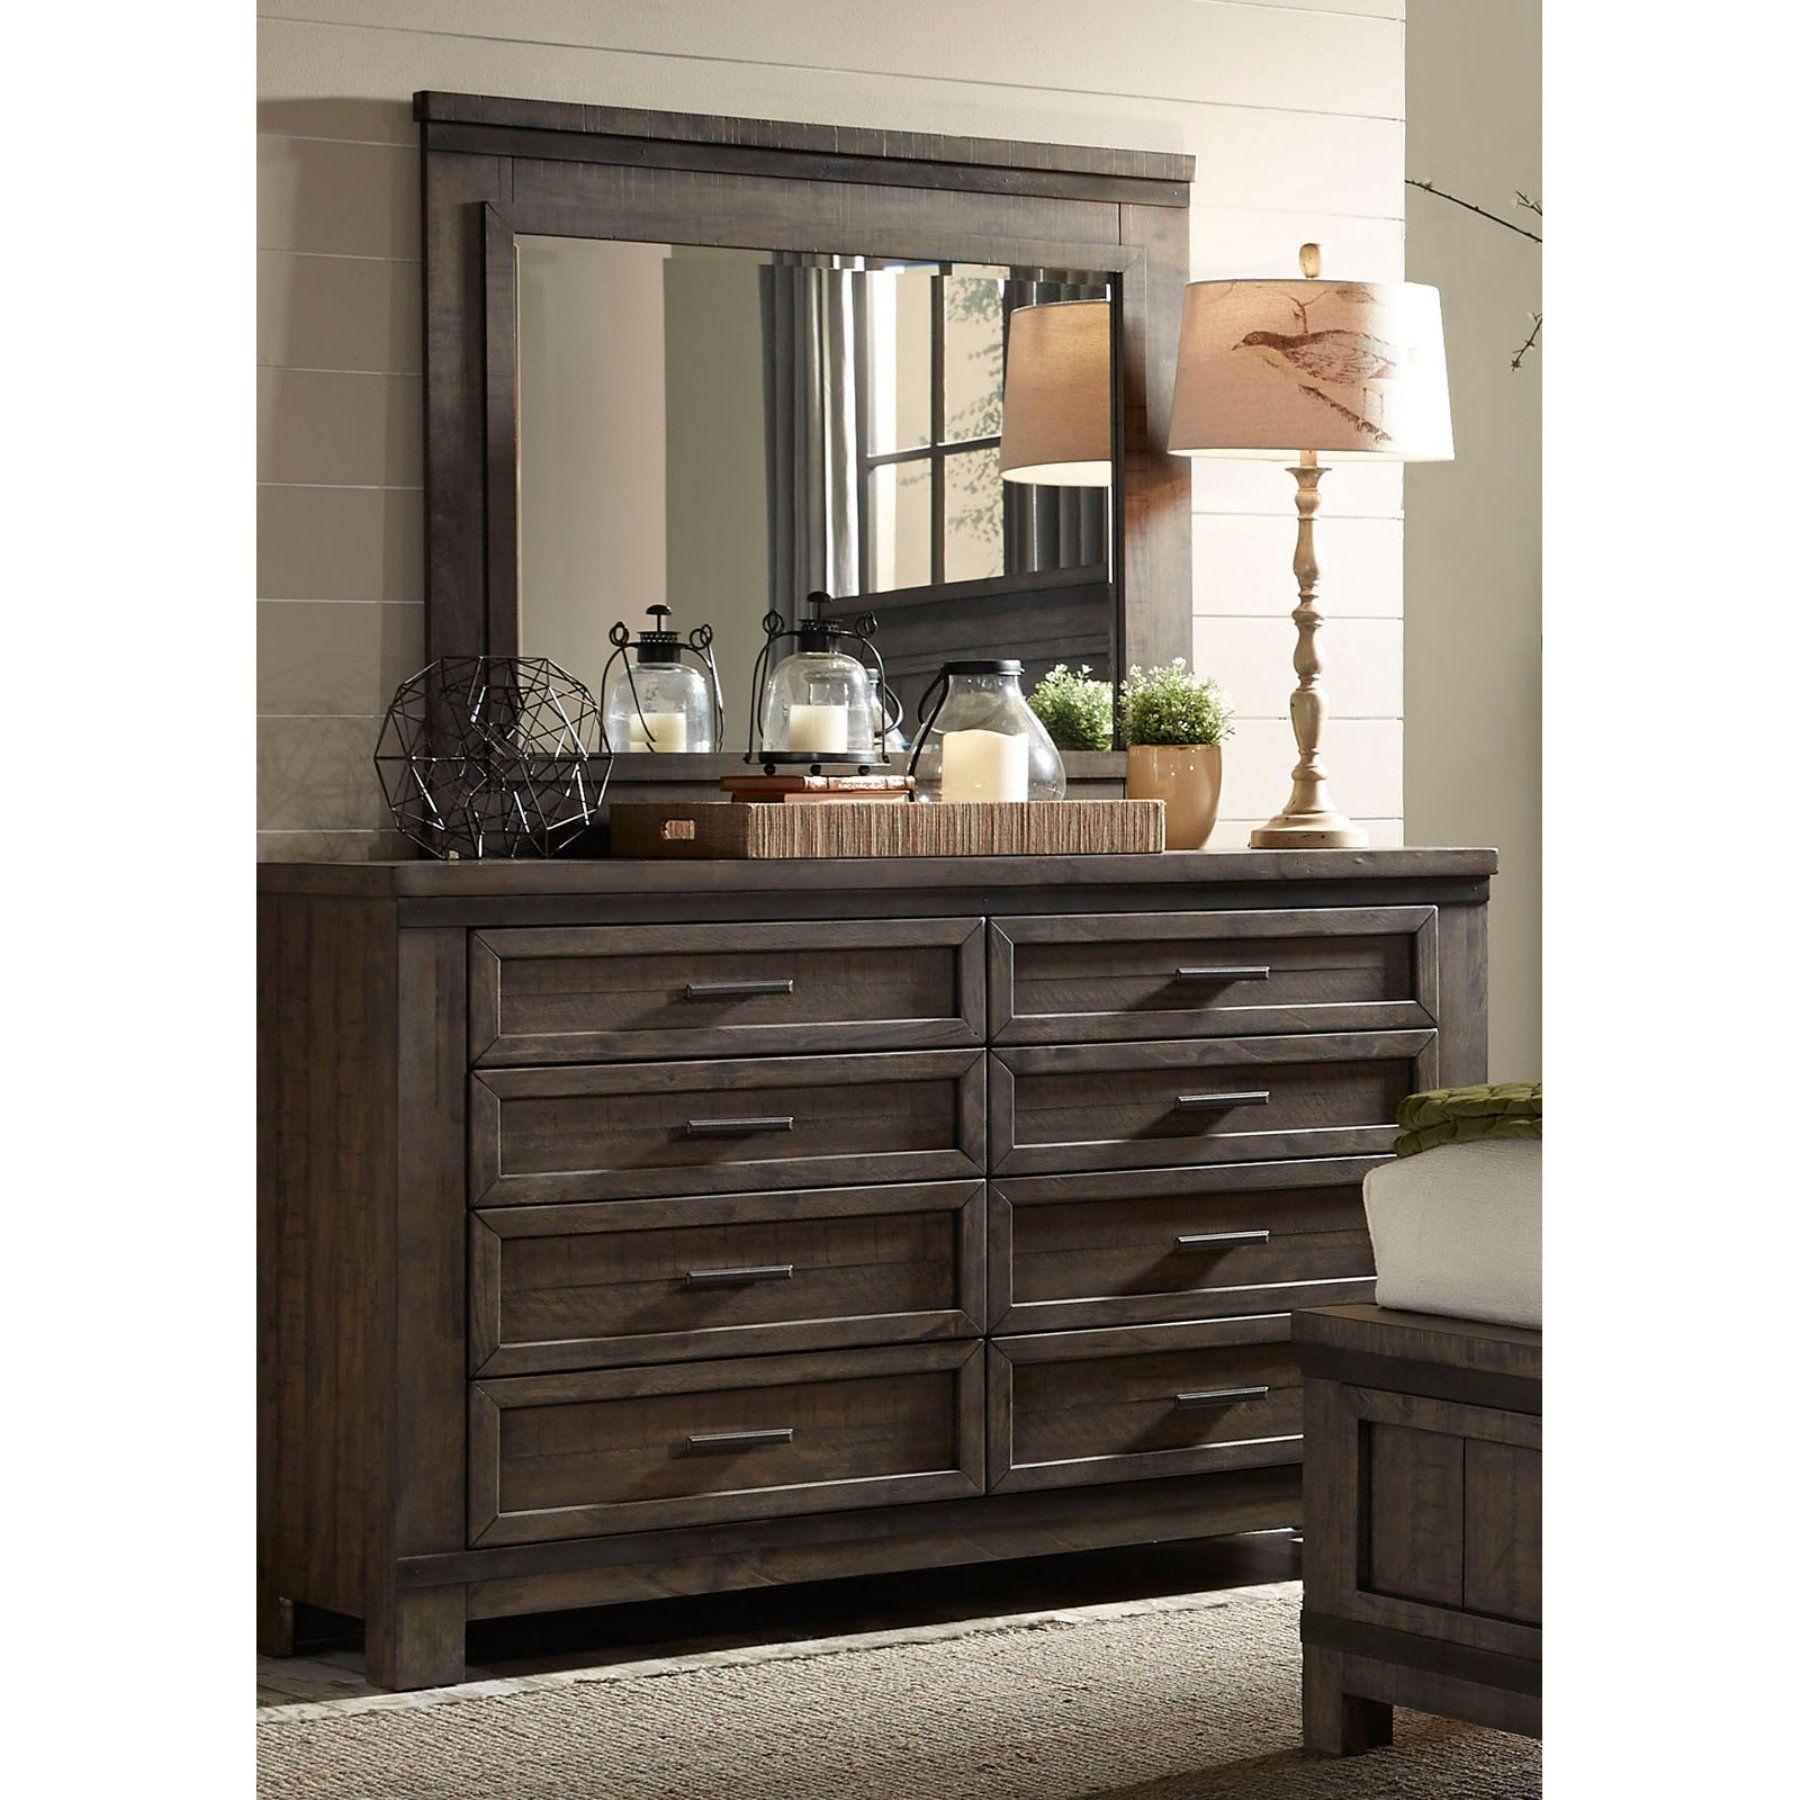 Liberty Furniture Thornwood Hills 8 Drawer Dresser 759